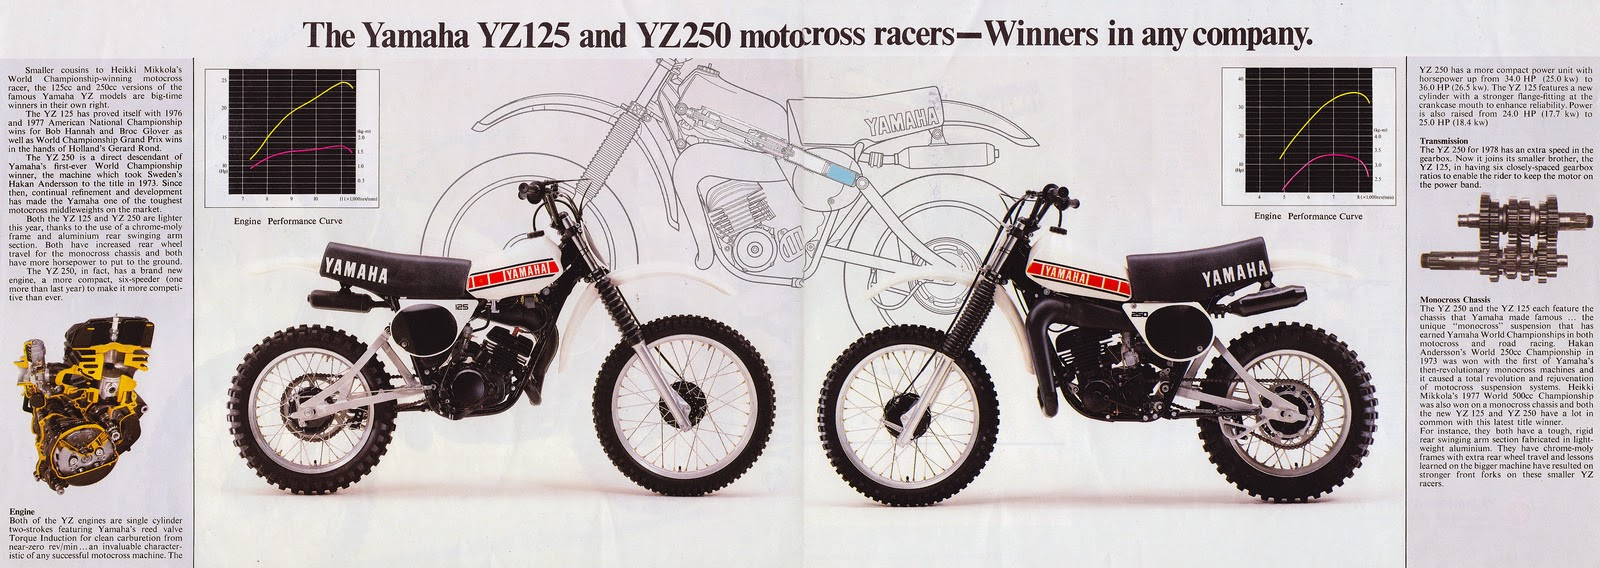 small resolution of racing caf vintage brochures yamaha yz 125 250 1978 wiring diagram also yz 125 clutch on 89 in addition suzuki gsx r 750